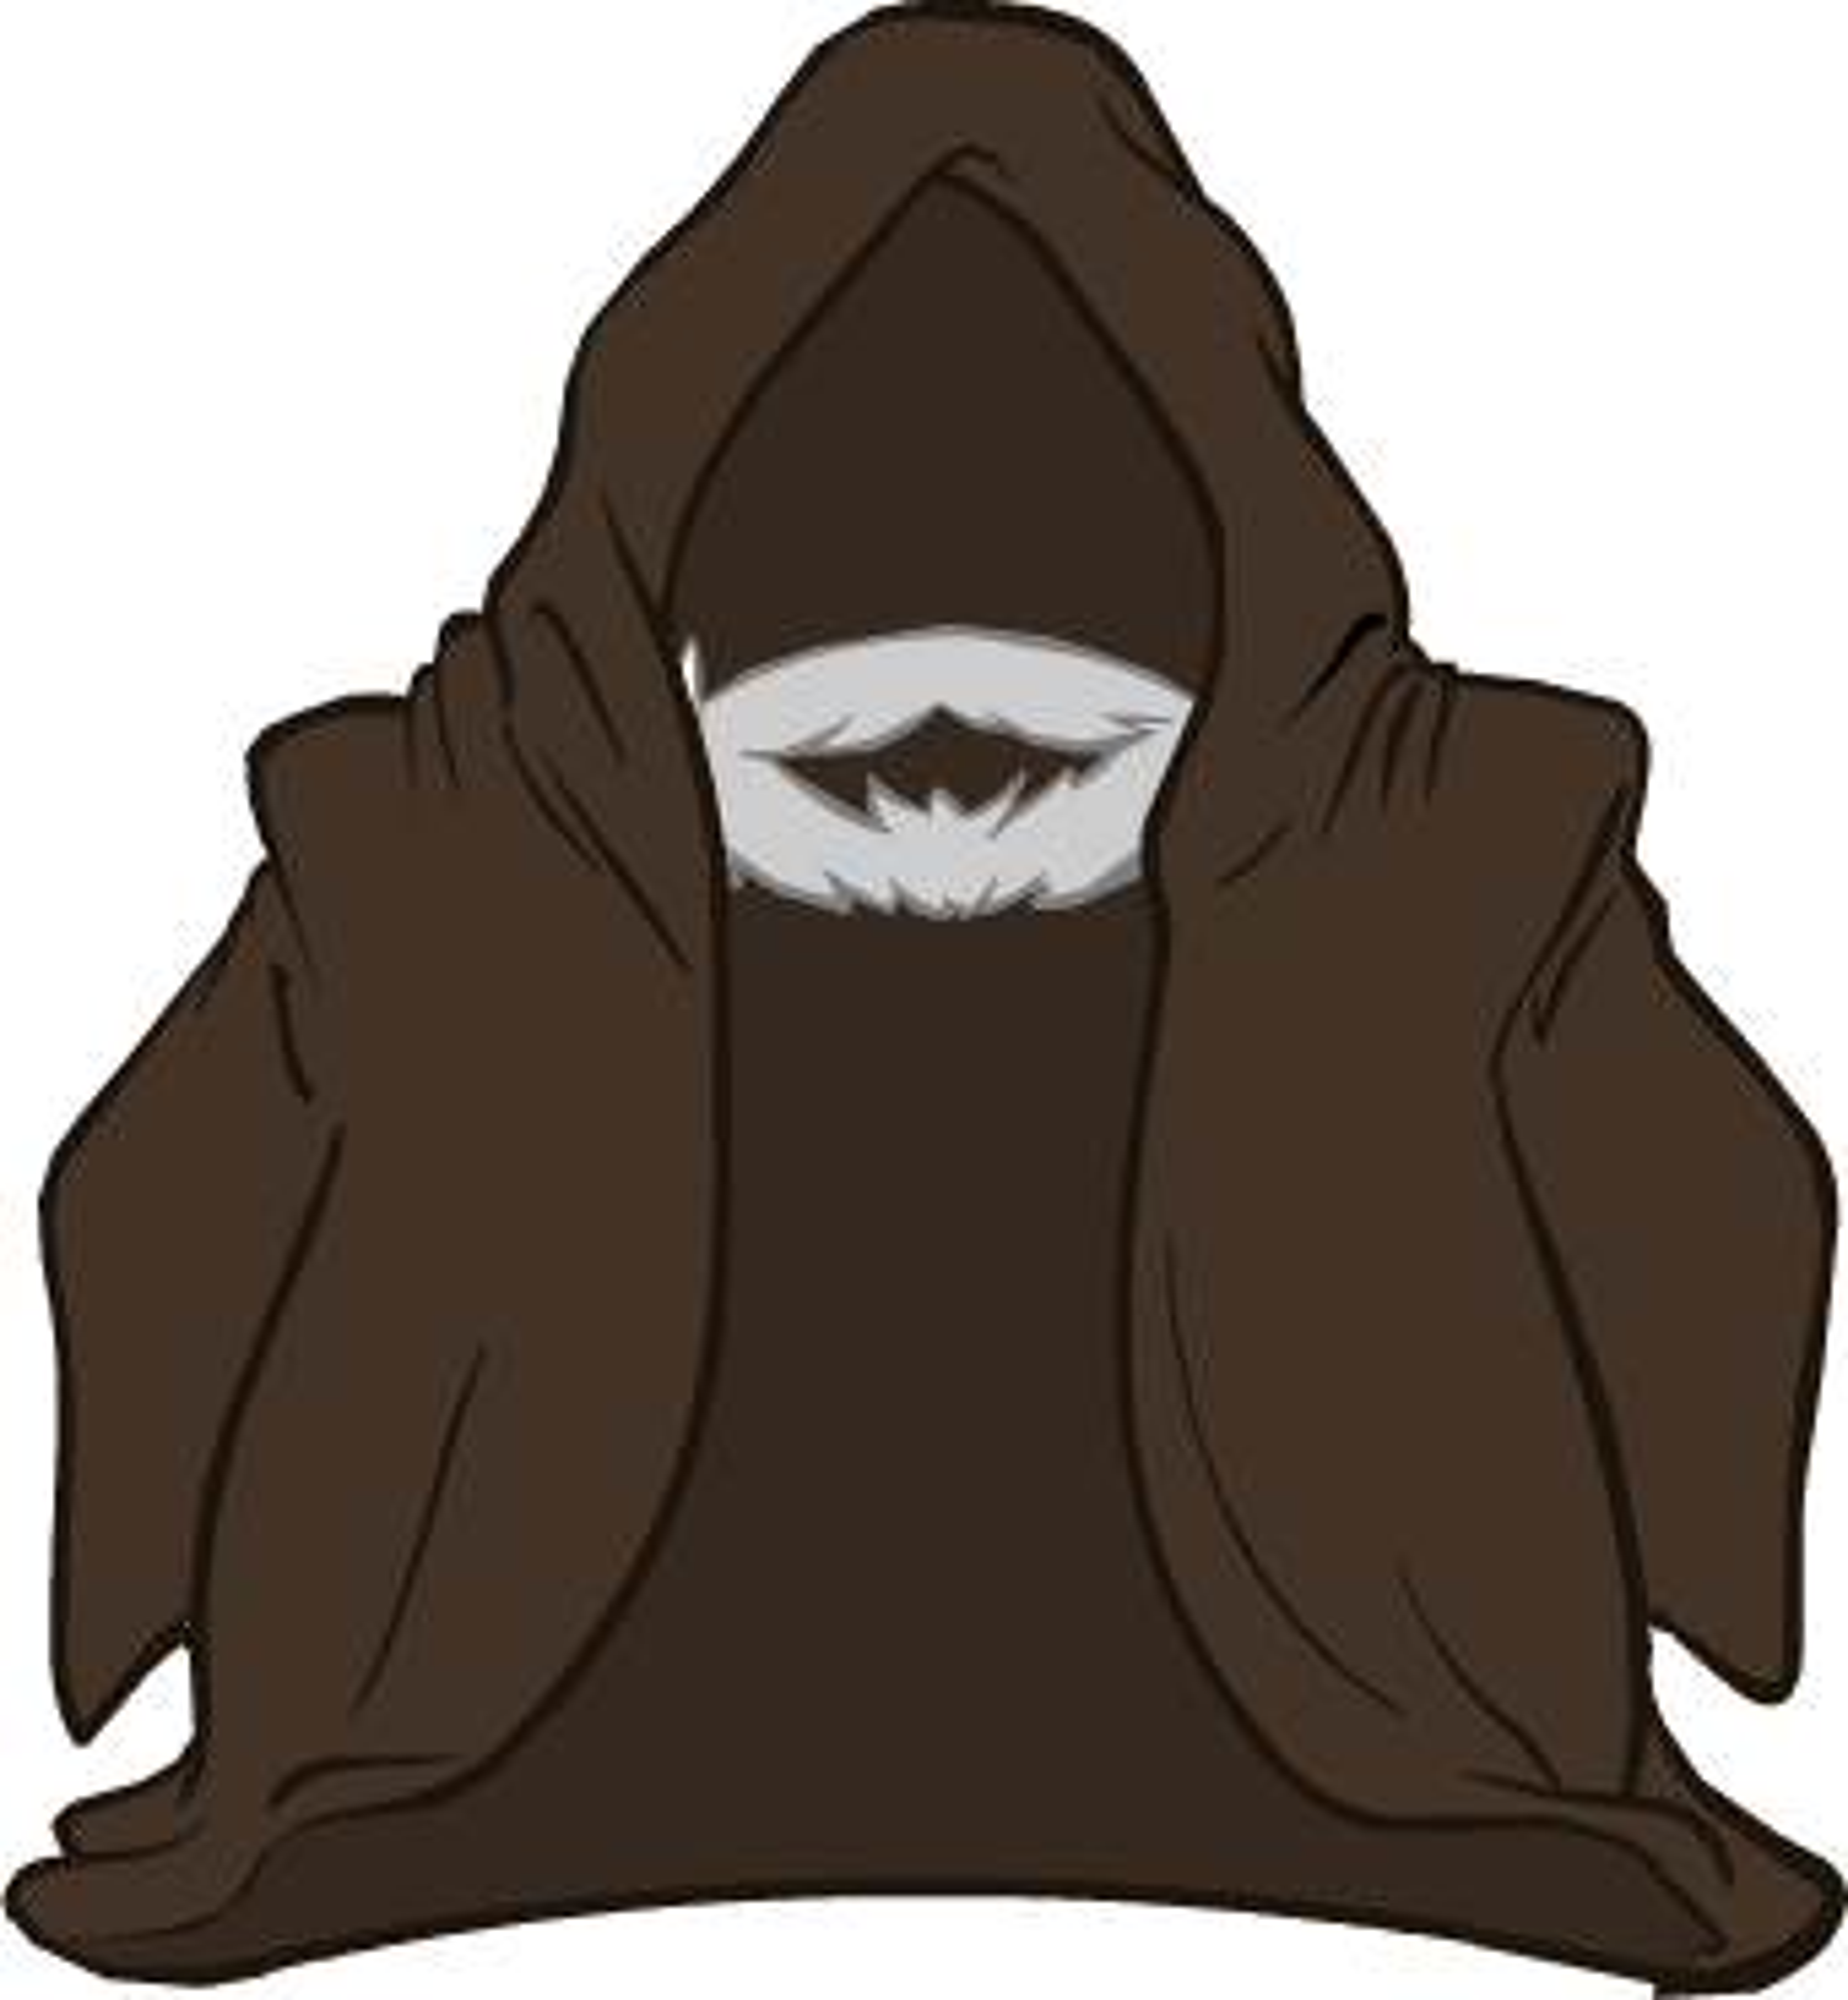 File:Obi-Wan Cloak icon.png